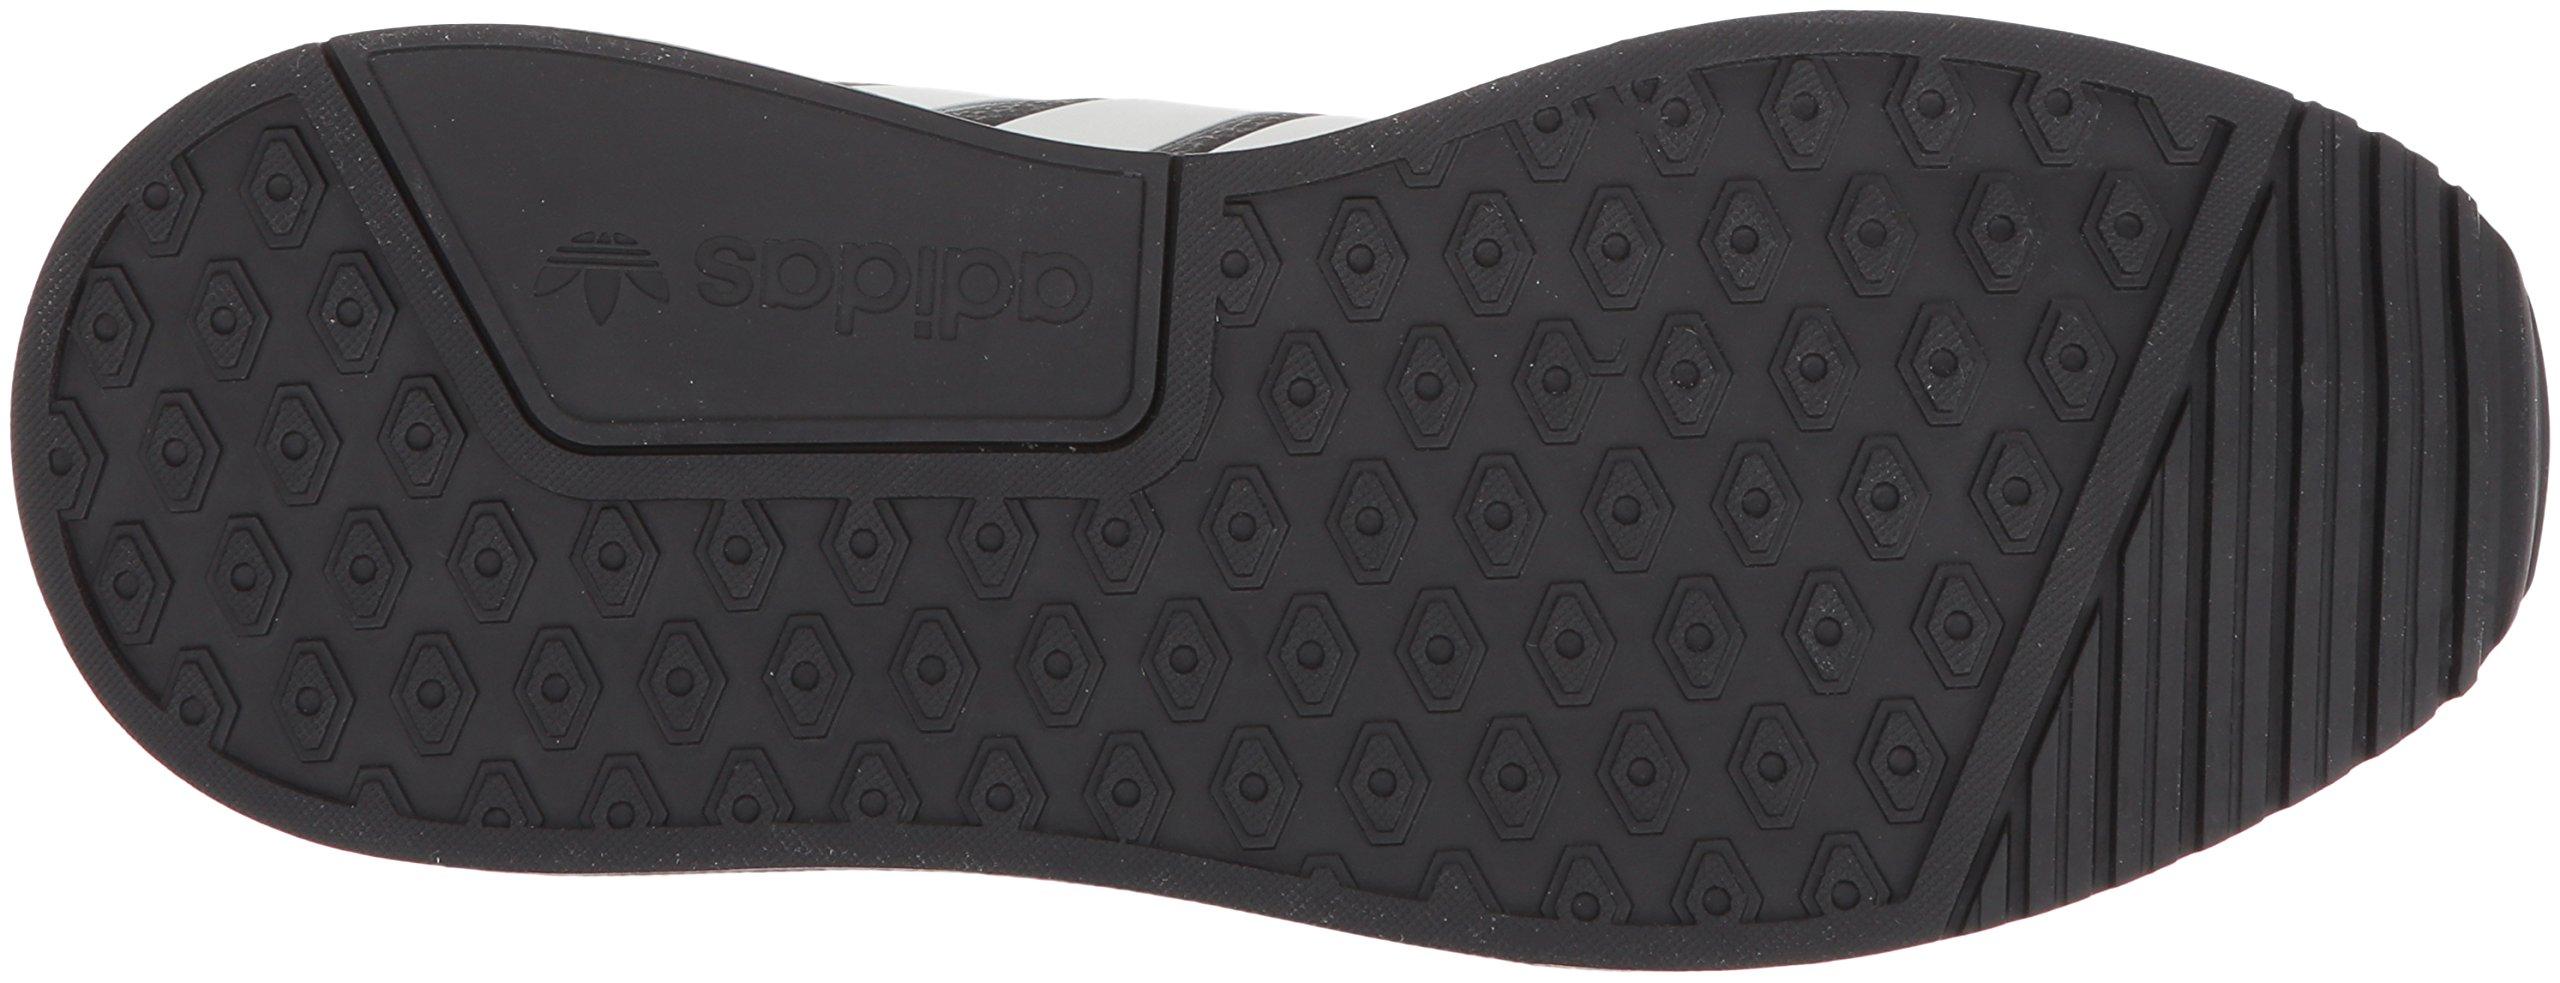 adidas Originals Mens X_PLR Running Shoe White/Black, 4.5 M US by adidas Originals (Image #3)